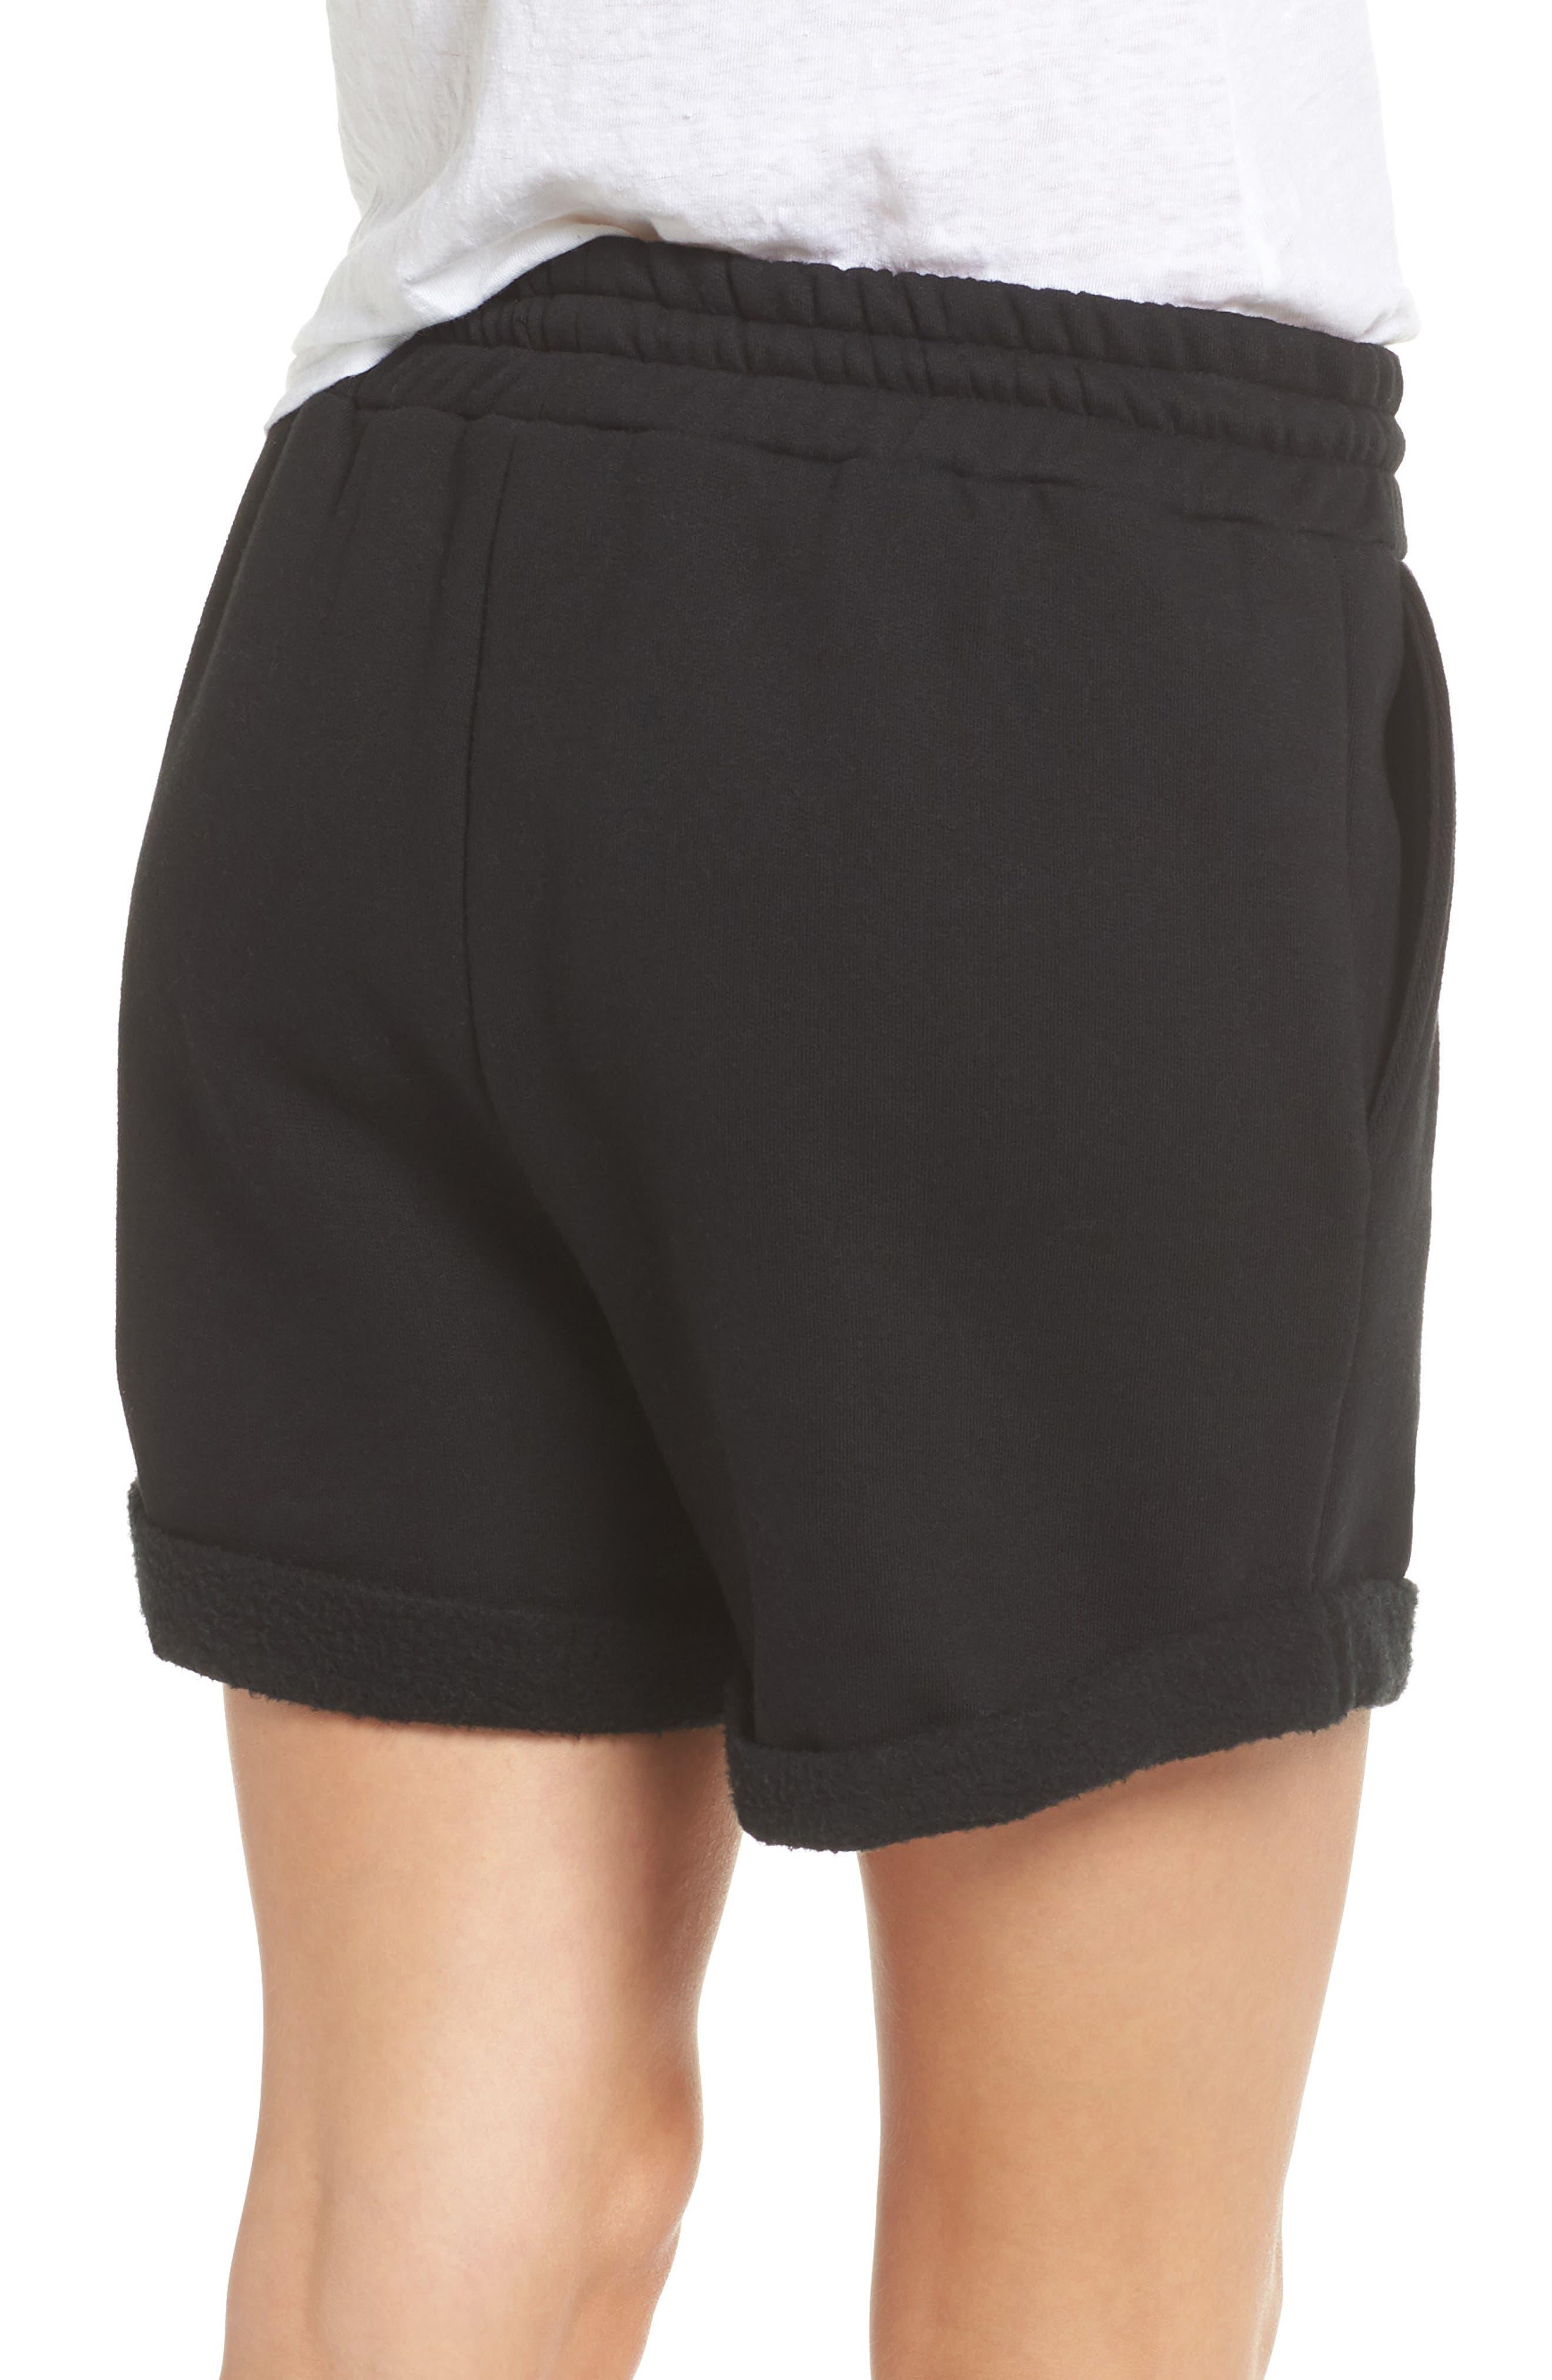 Blonde Lounge Shorts,                             Alternate thumbnail 2, color,                             008